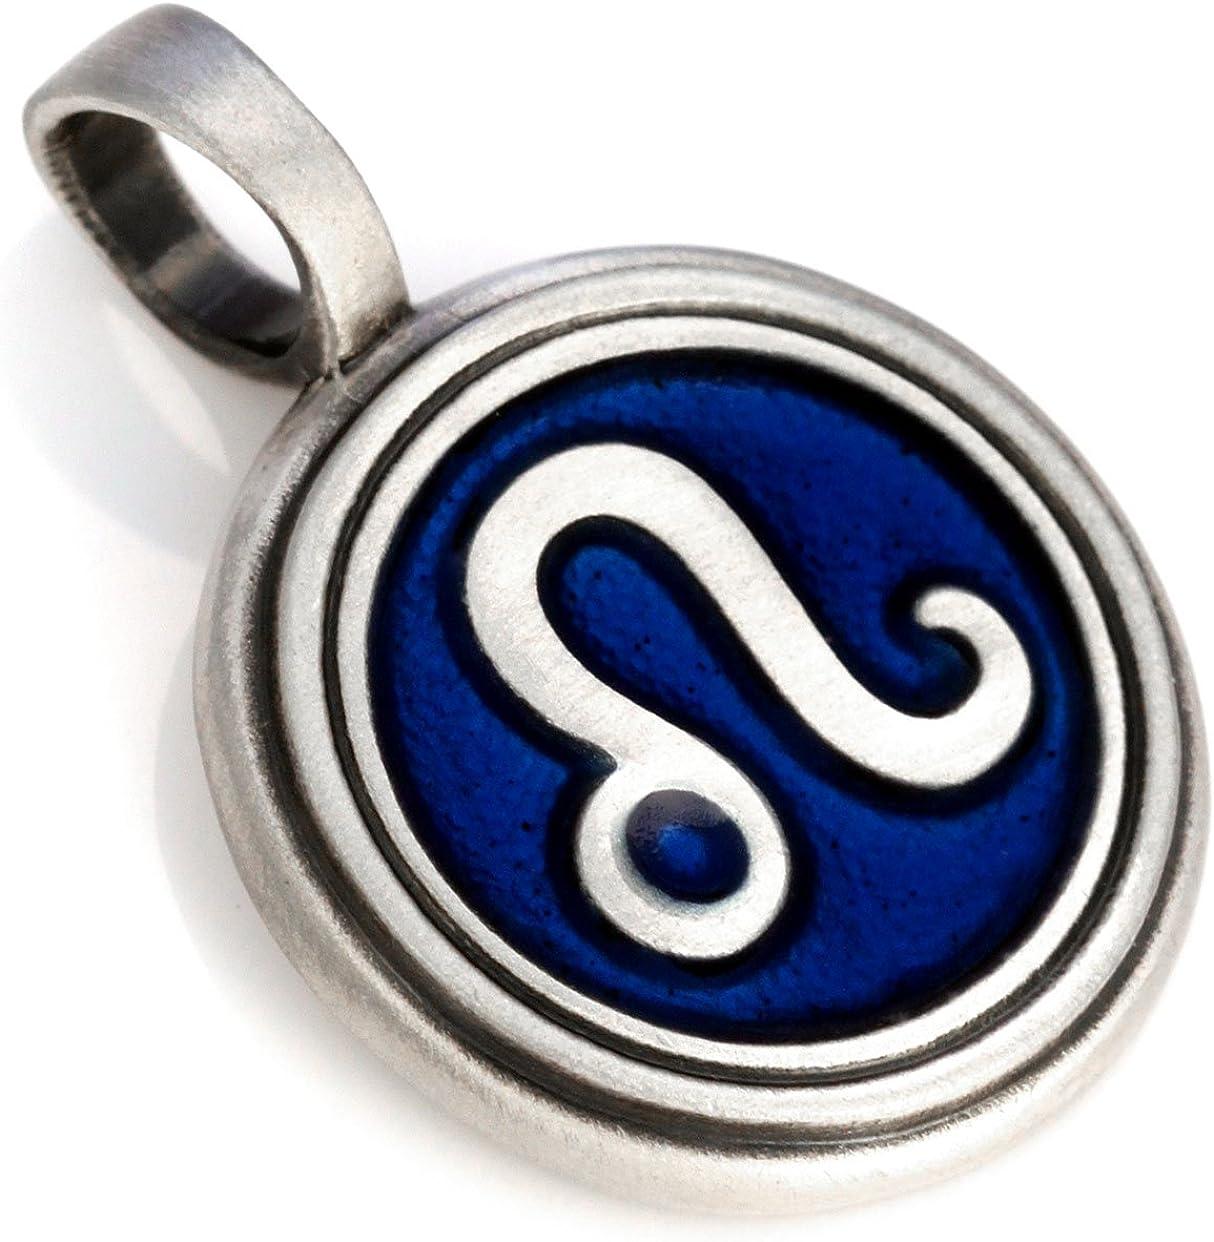 Bico Leo Zodiac Pendant (Z8) - starsign - Colored Resin and Metal Tribal Street Jewelry